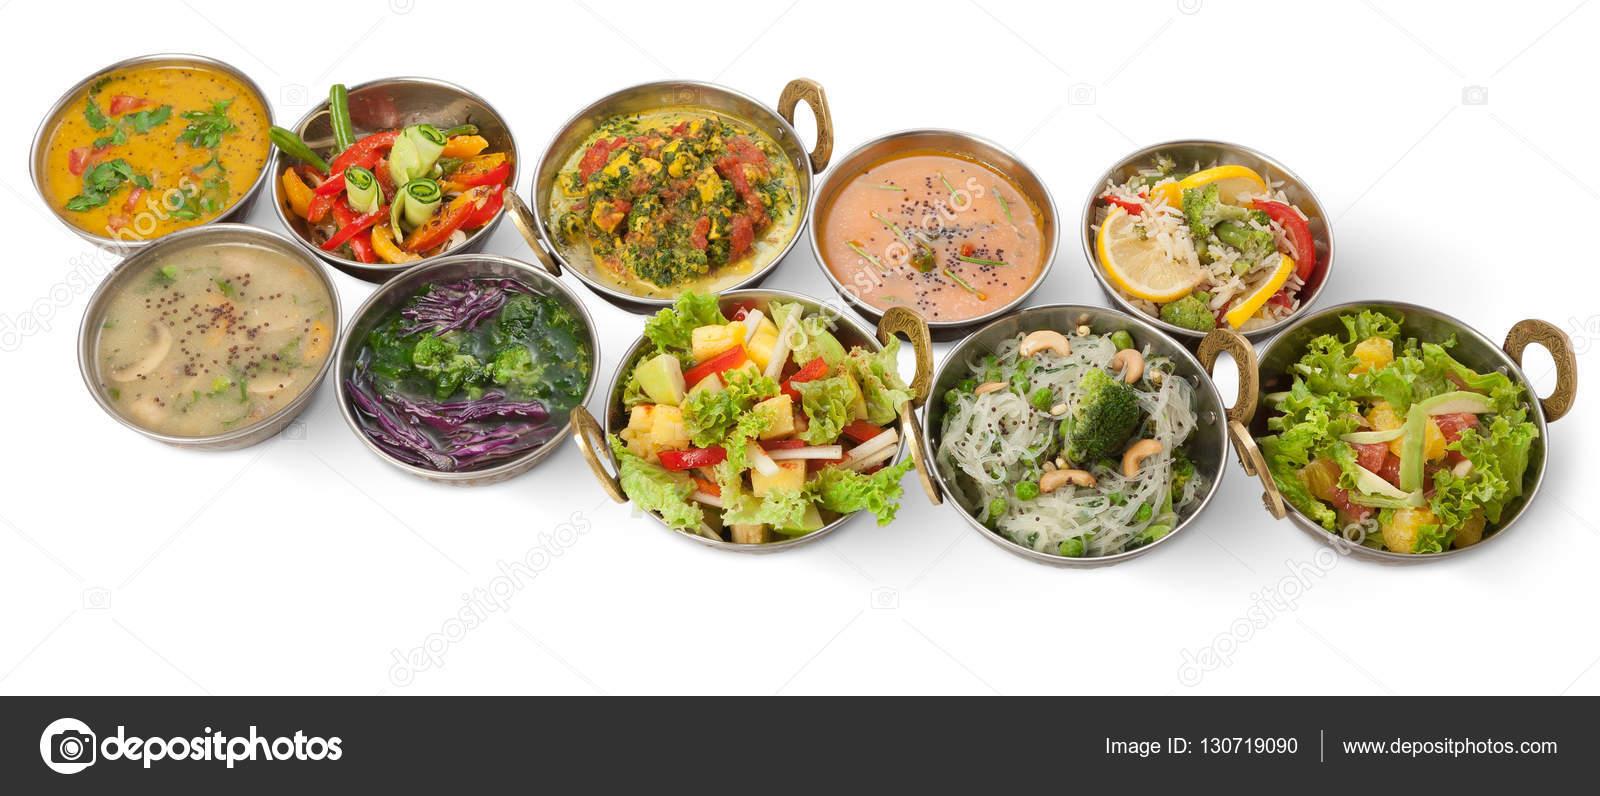 Vegan and vegetarian indian cuisine hot spicy dishes stock photo vegan and vegetarian indian cuisine hot spicy dishes stock photo forumfinder Gallery